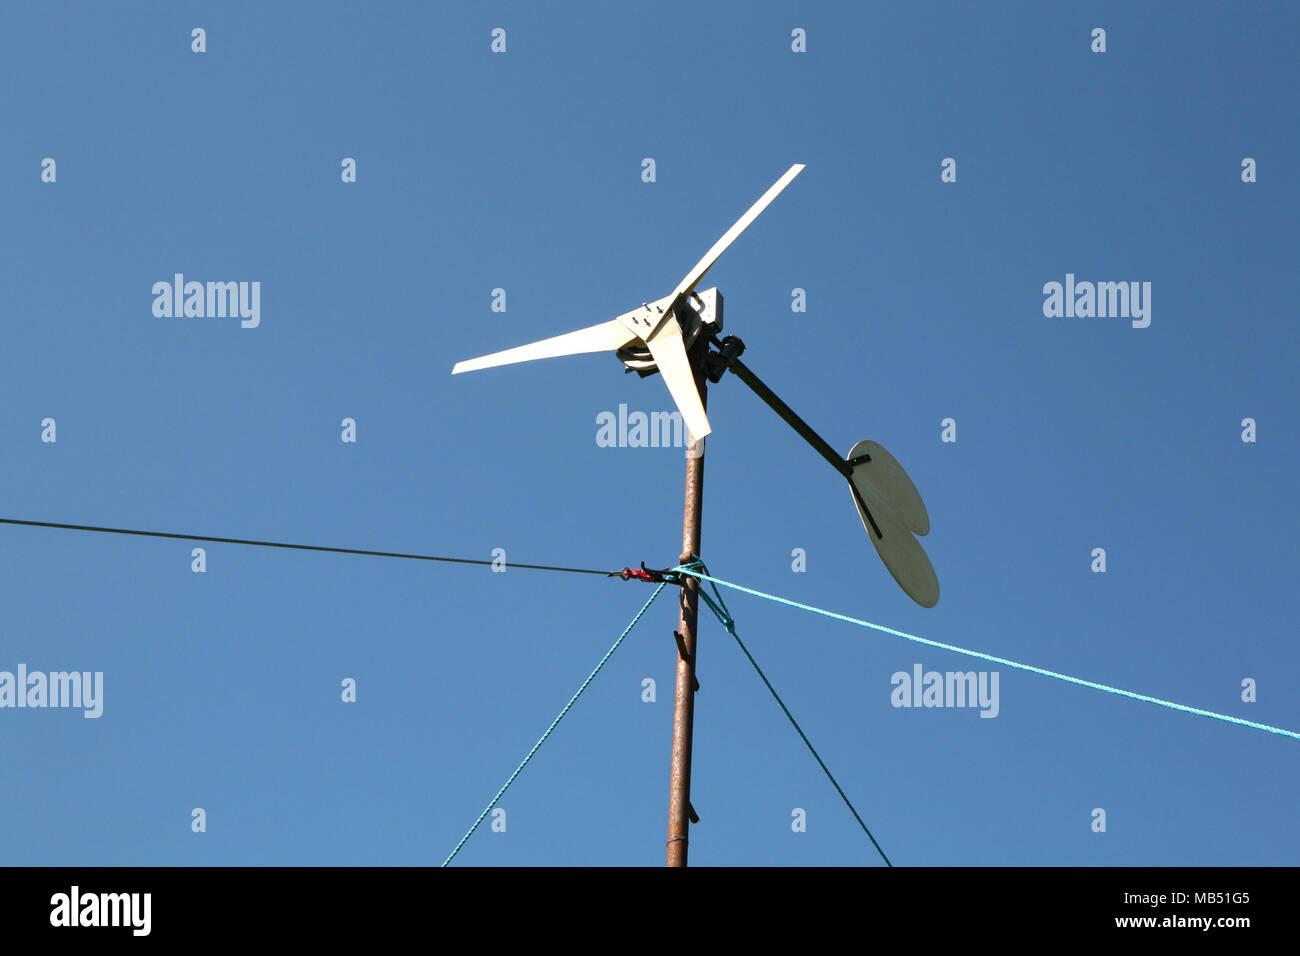 Kleinen Wind Turbine saubere Energie Produktion selbstgebauten Stockbild